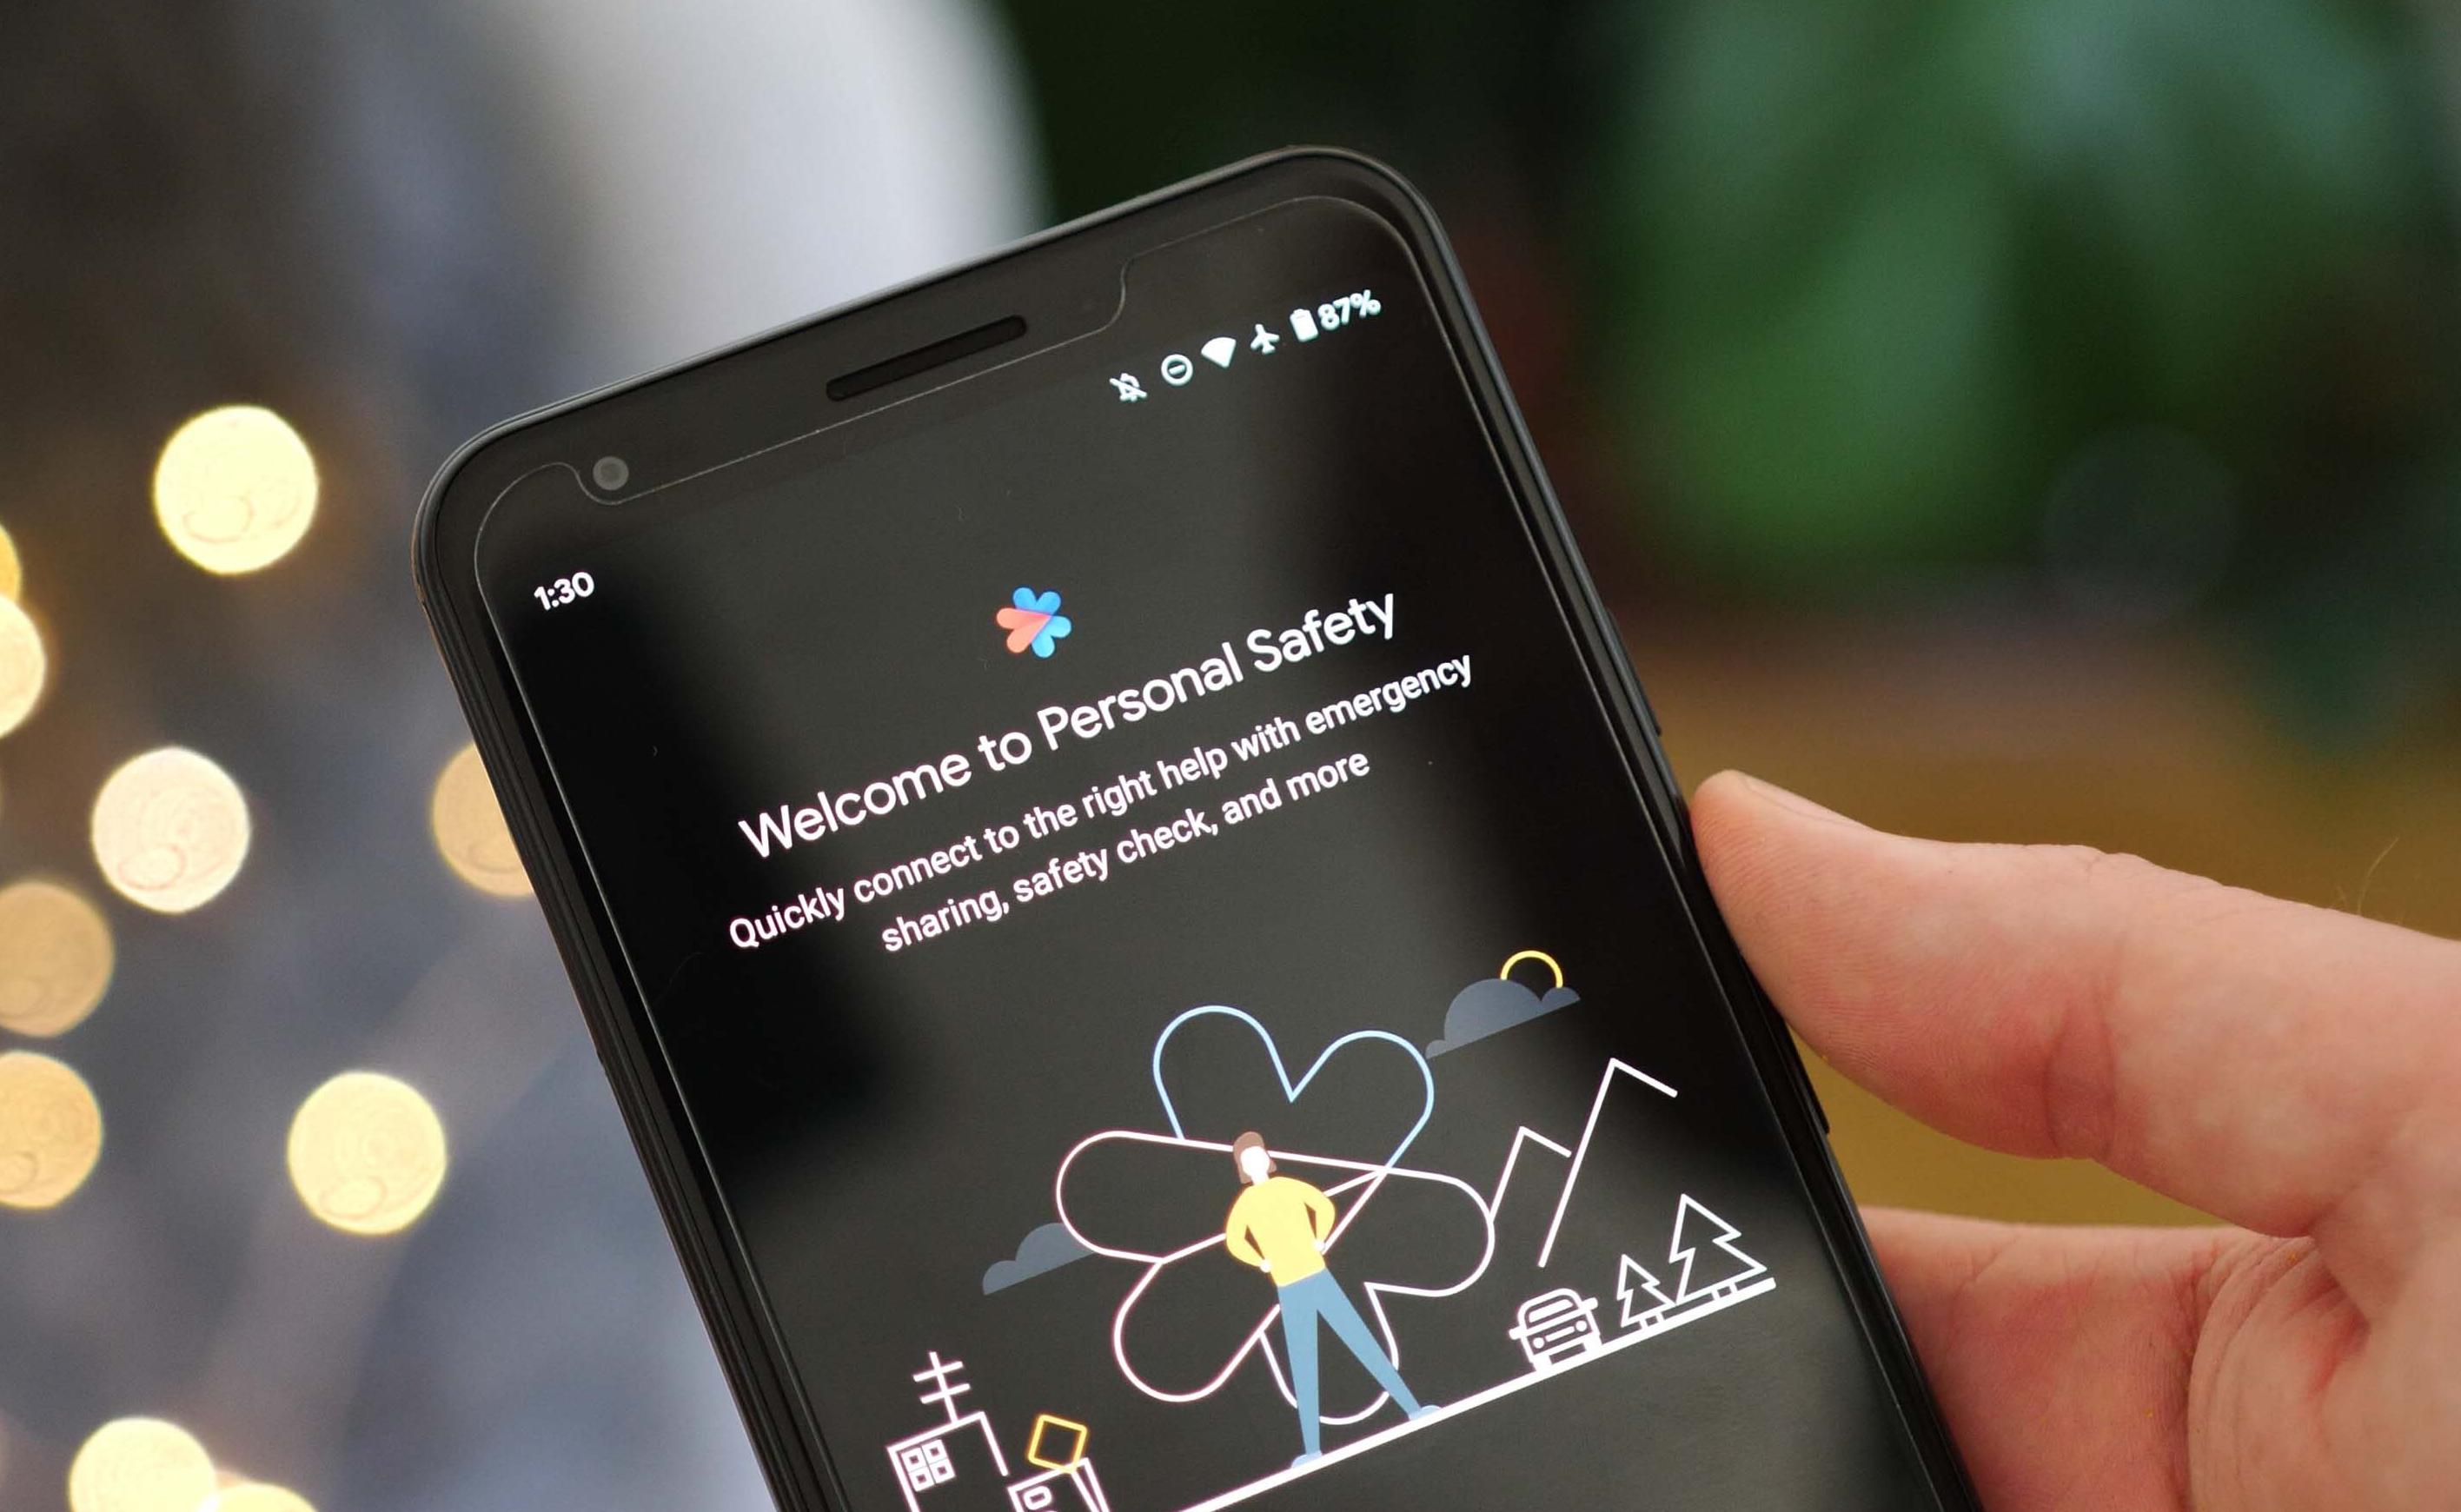 Google Pixel: Αυτόματη καταγραφή και upload βίντεο σε ανάγκη